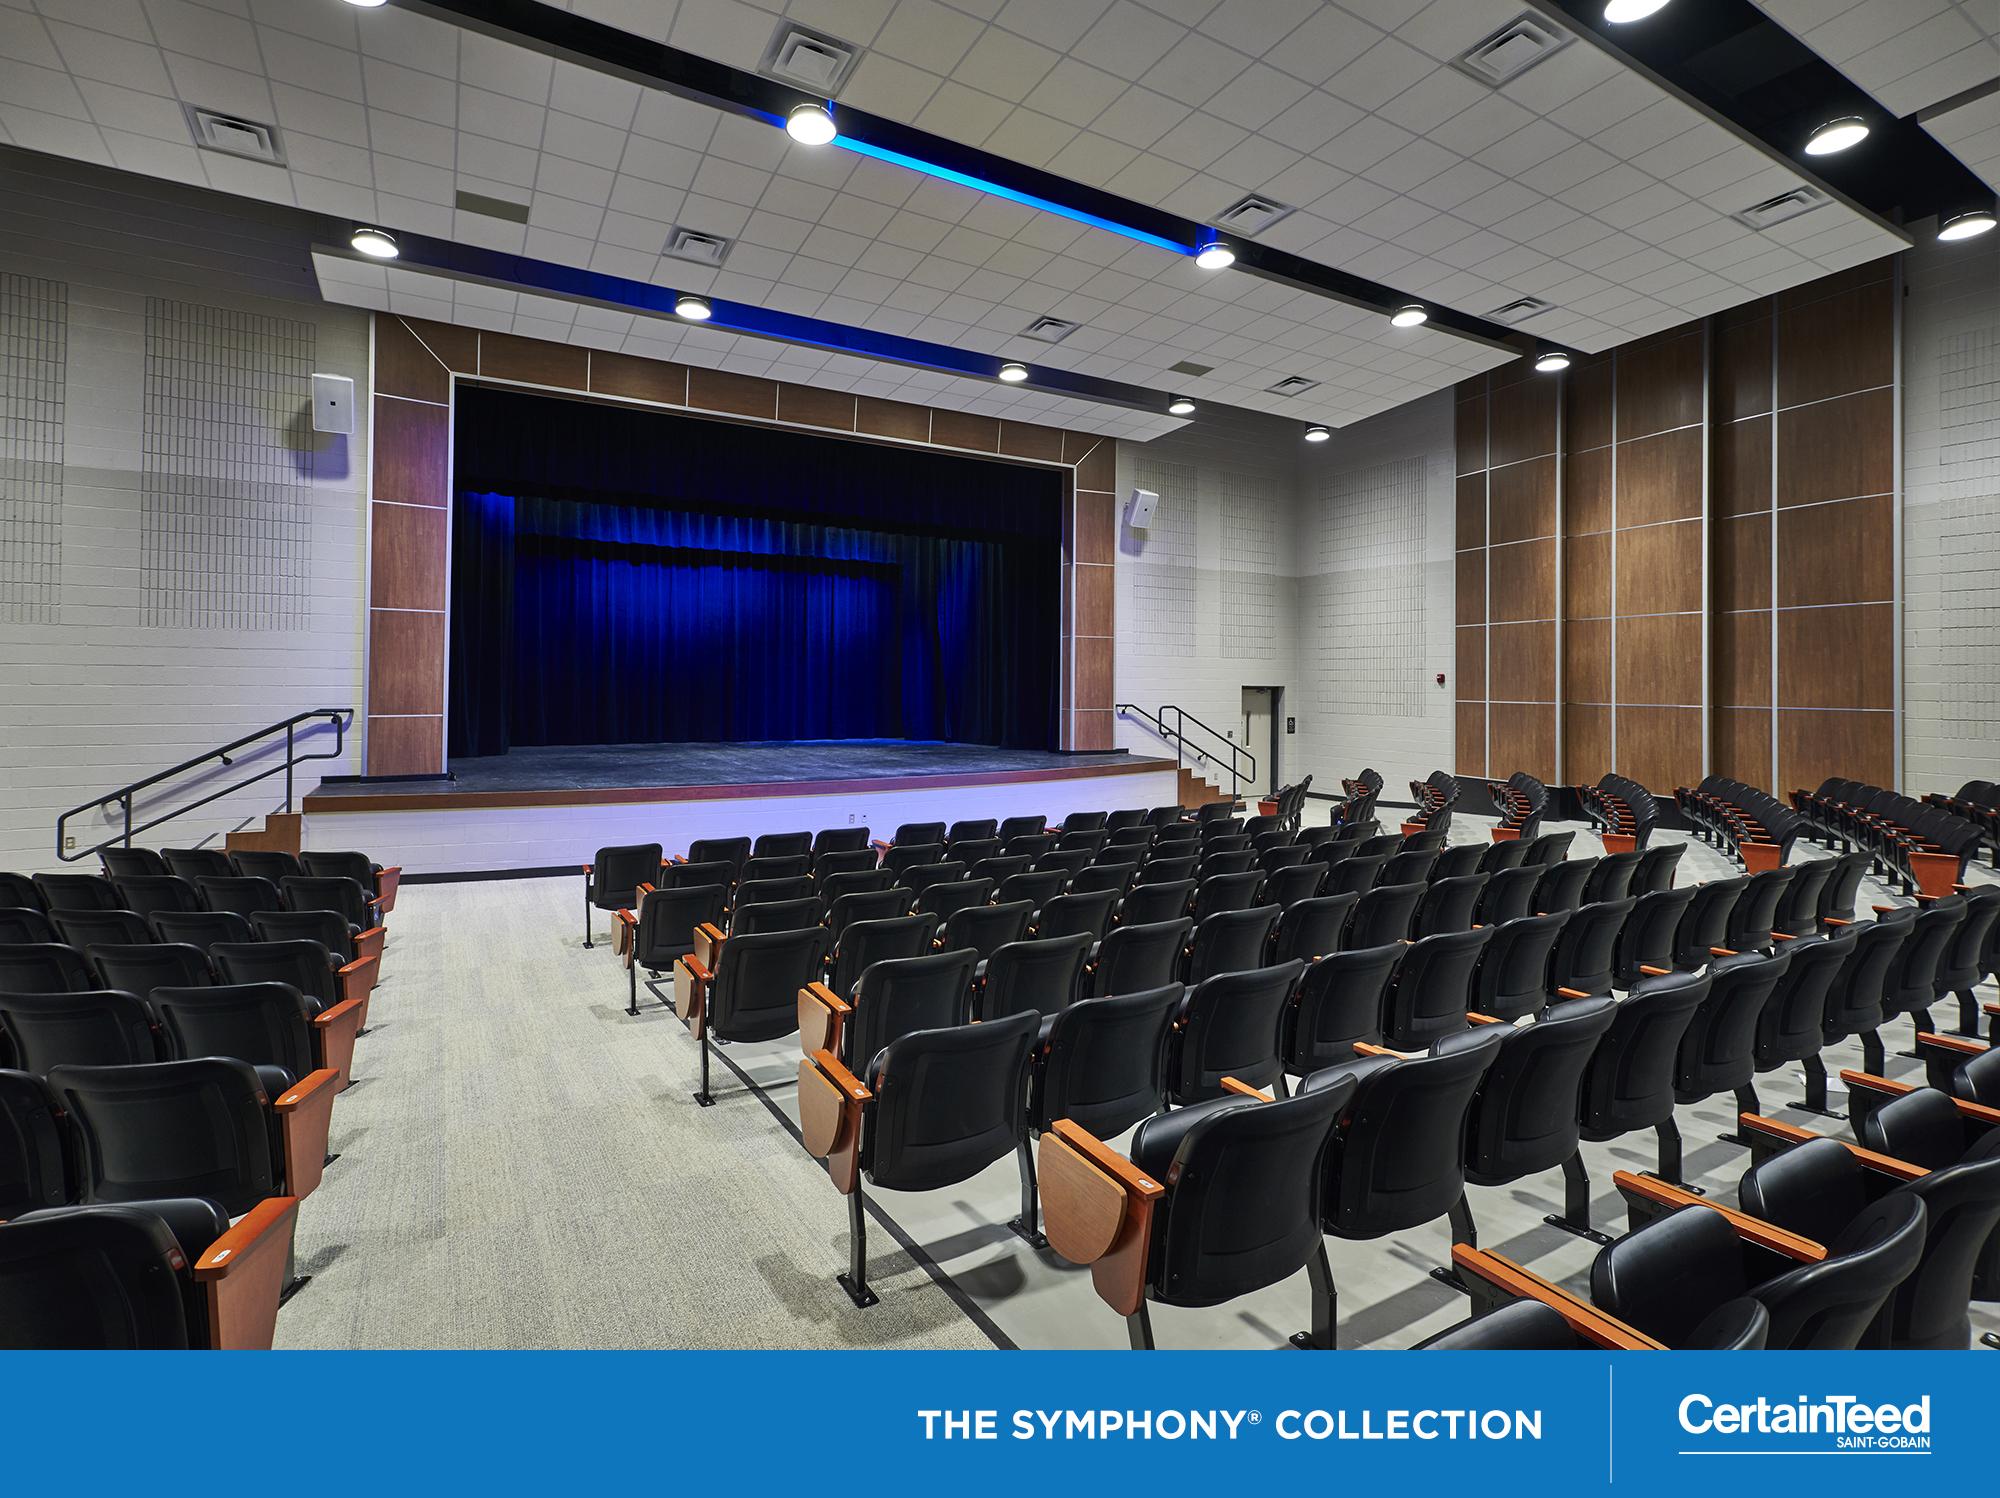 ADAGIO: Unique composite panel with encapsulated fiberglass | Highest combination of sound absorption & noise blocking | NRC 0.90